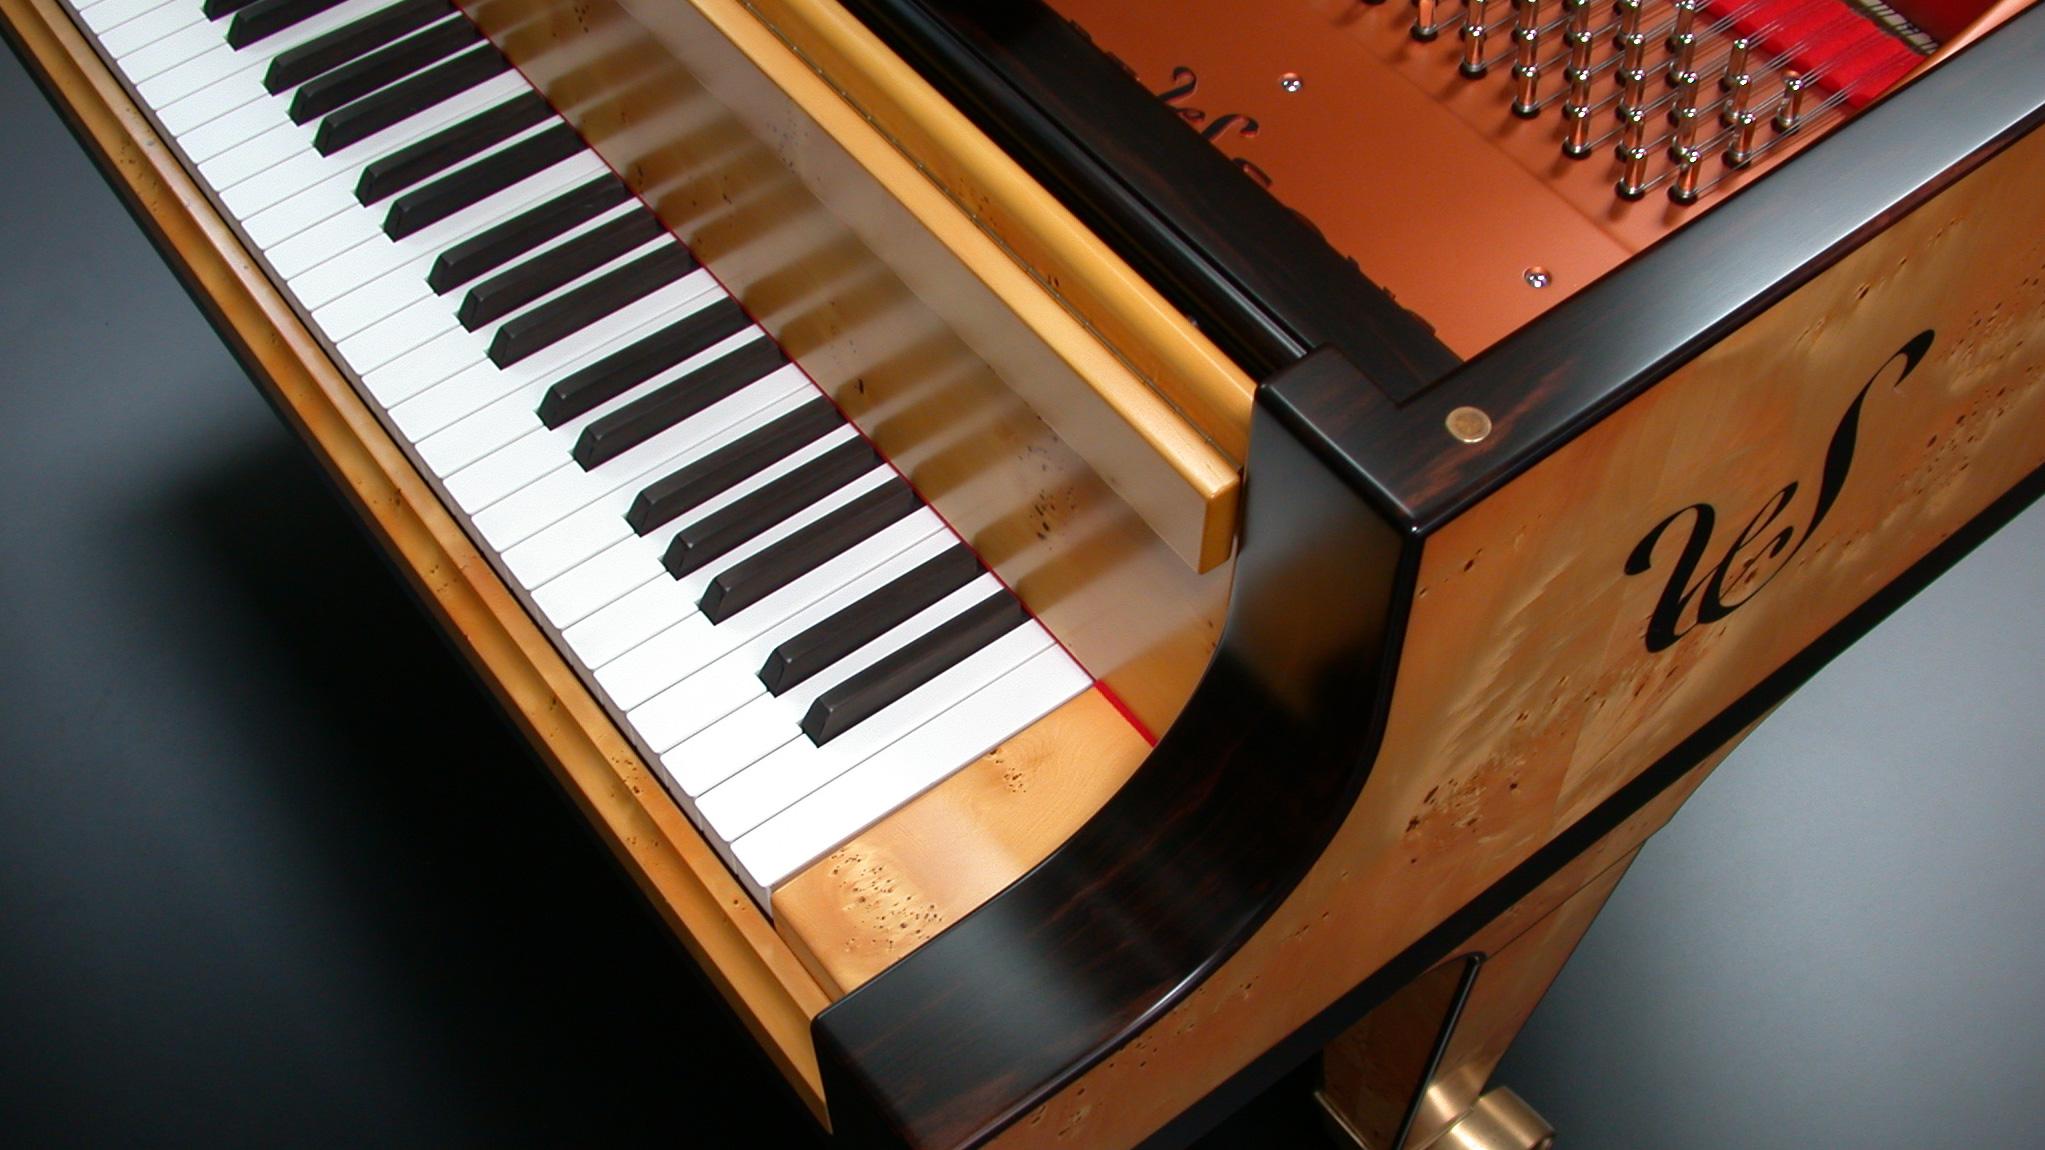 Musical Innovation: A Grander Grand Piano